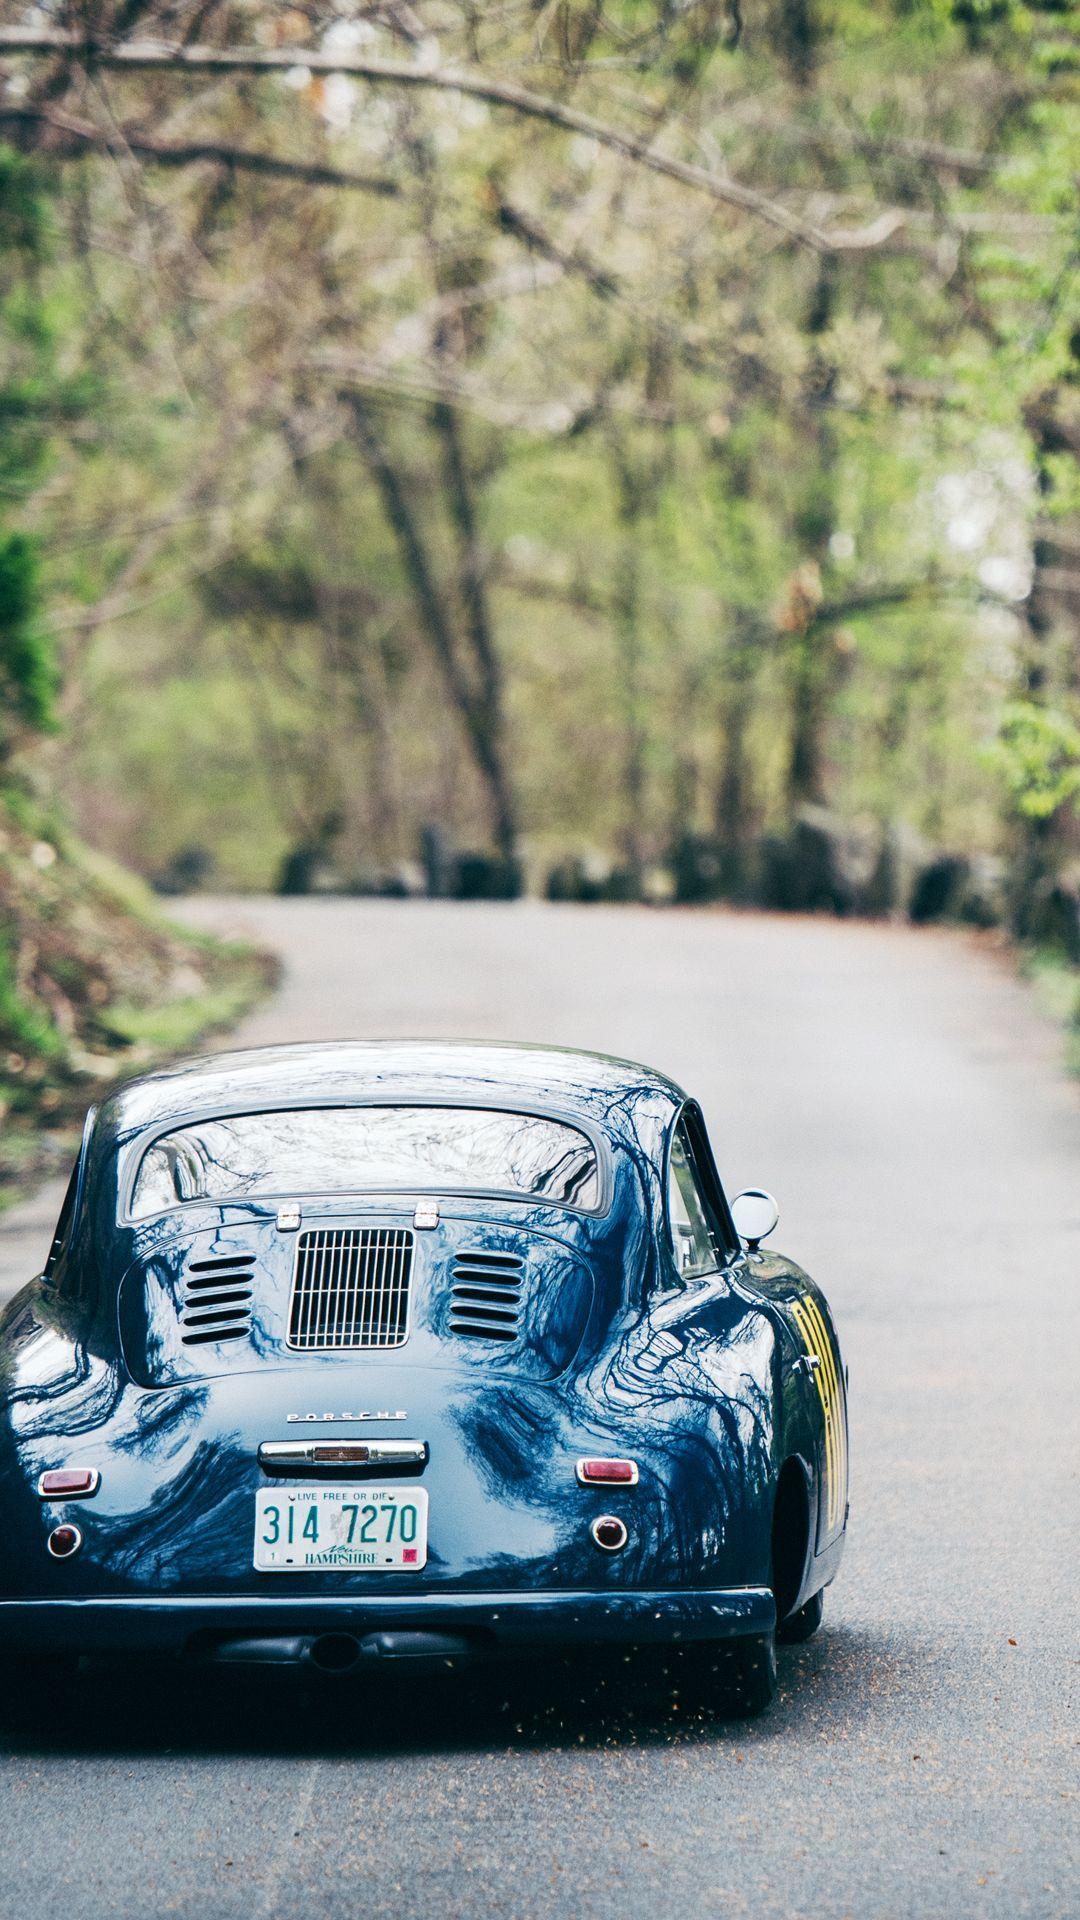 Classic Porsche Wallpapers , Top Free Classic Porsche